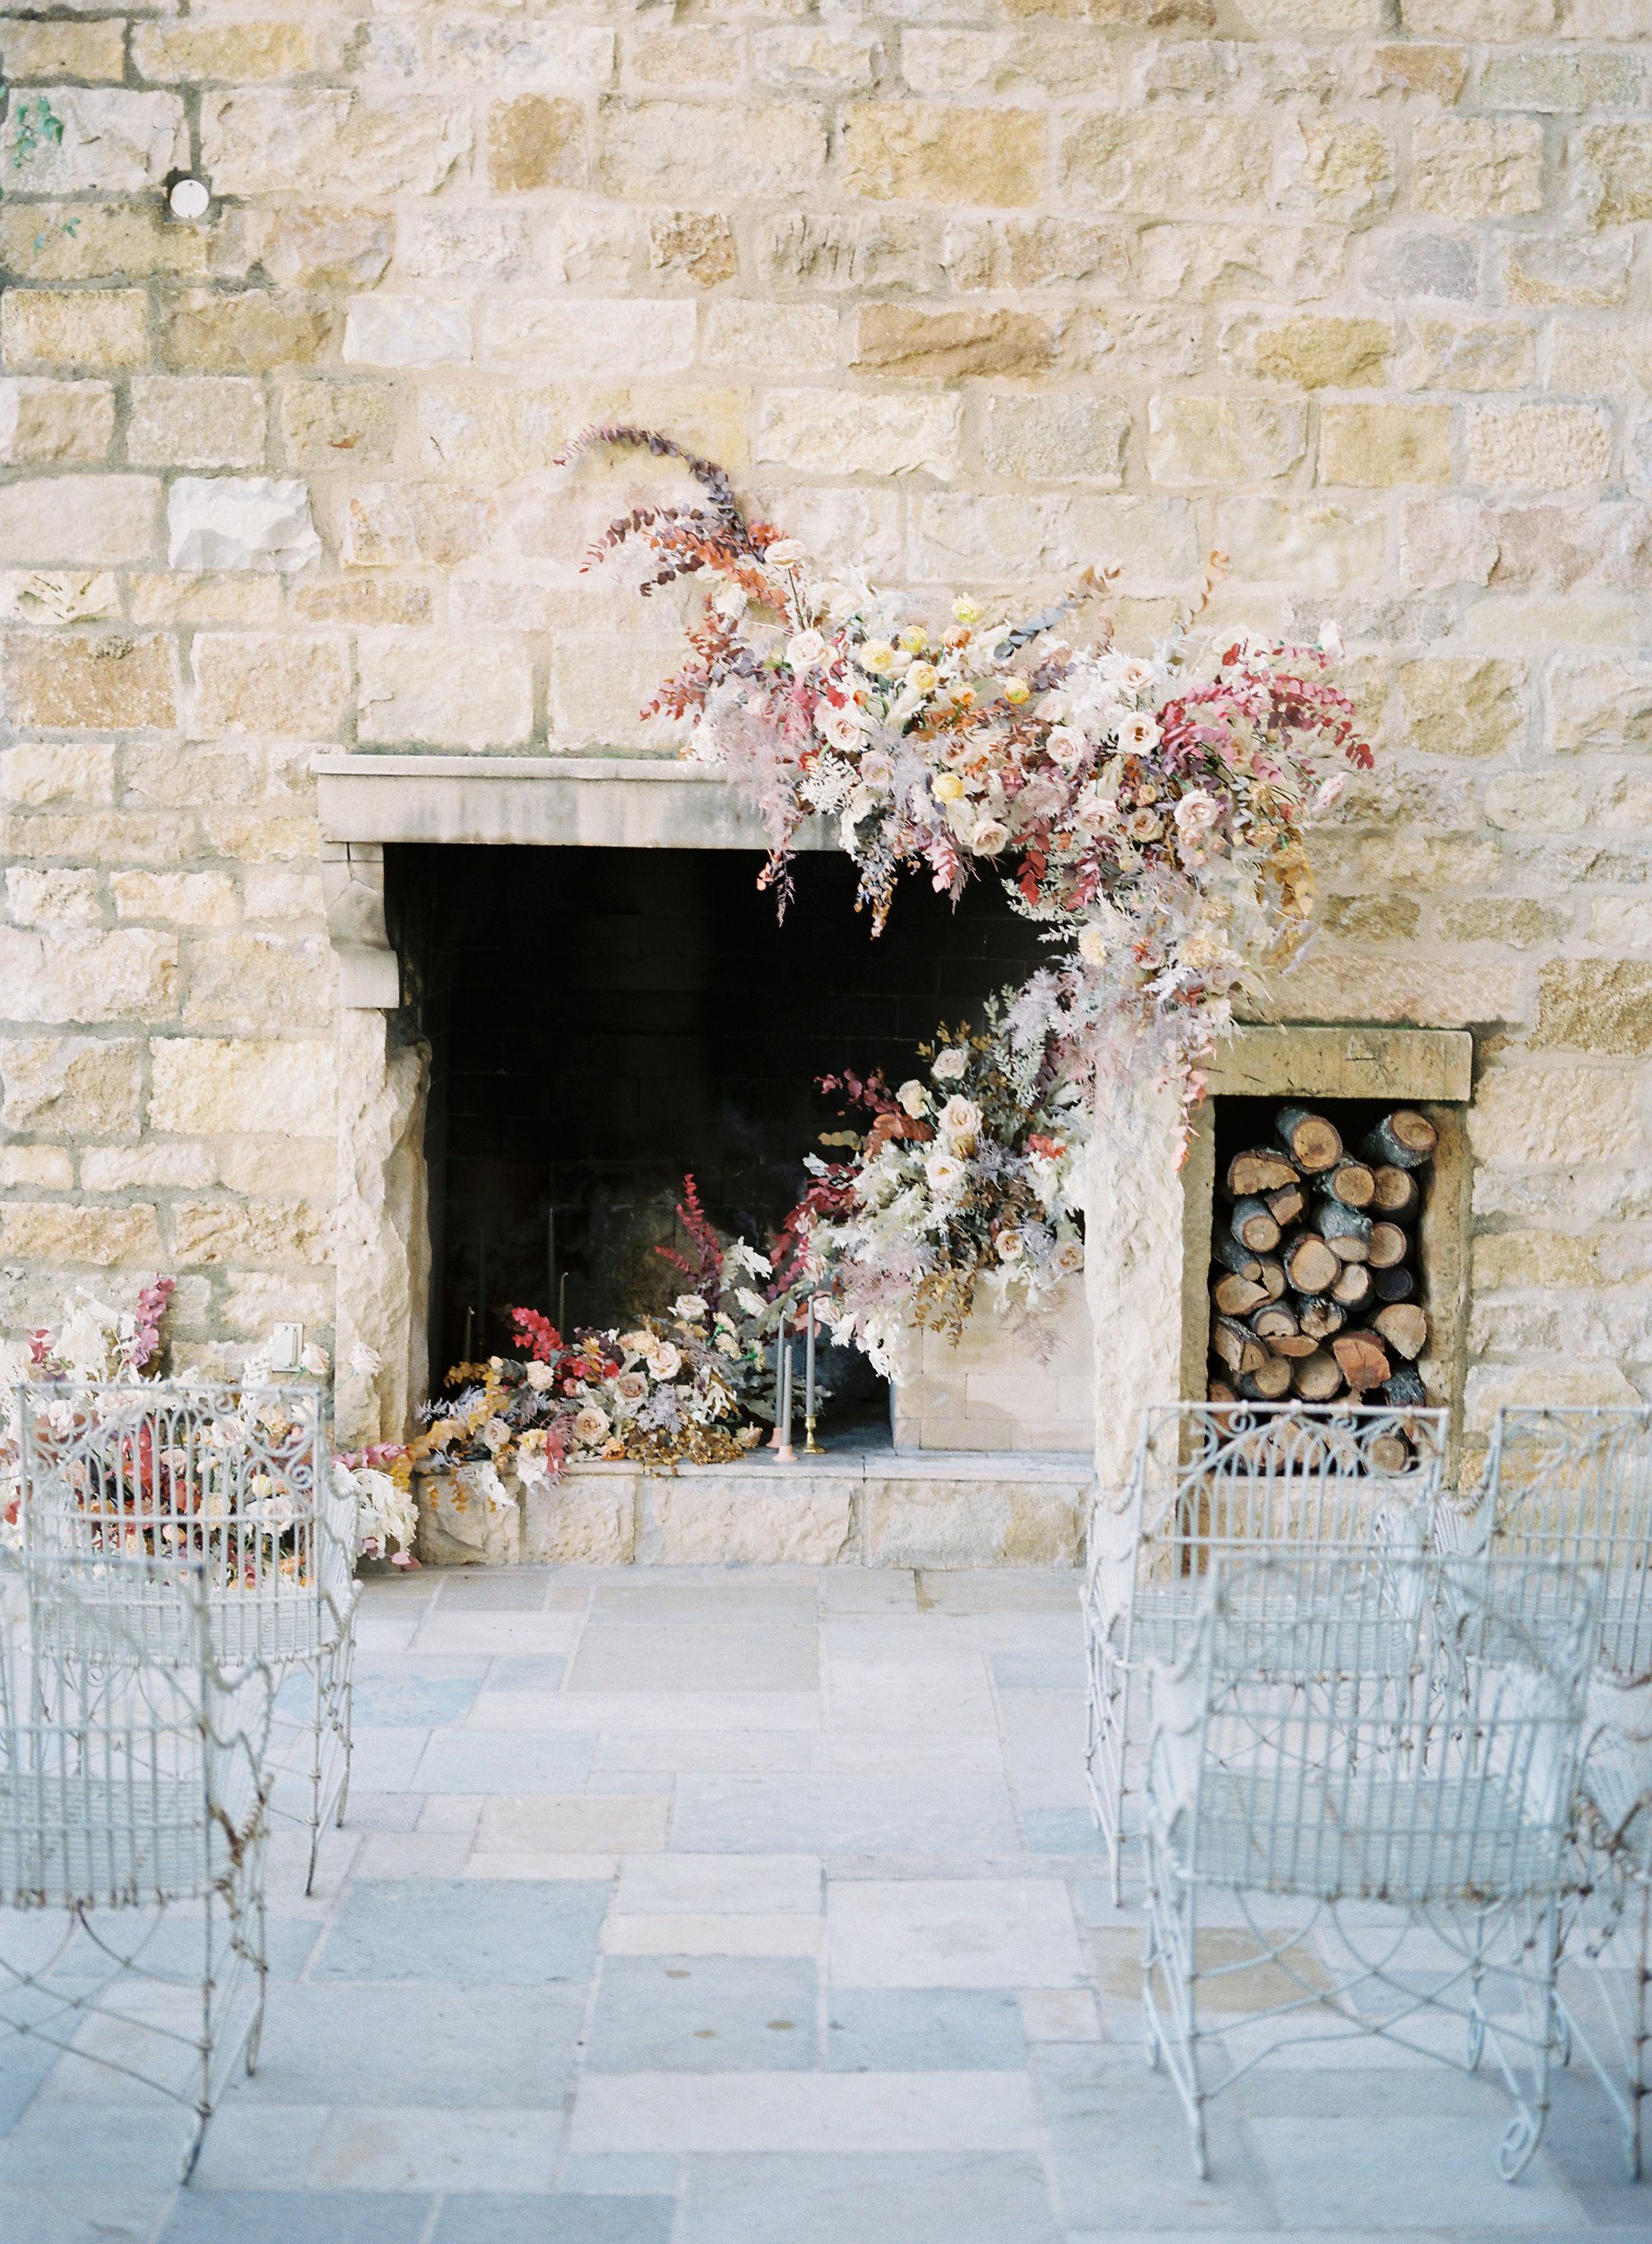 jessica-zimmerman-events-sunstone-ceremony-mantle-arrangement-fireplace.jpg